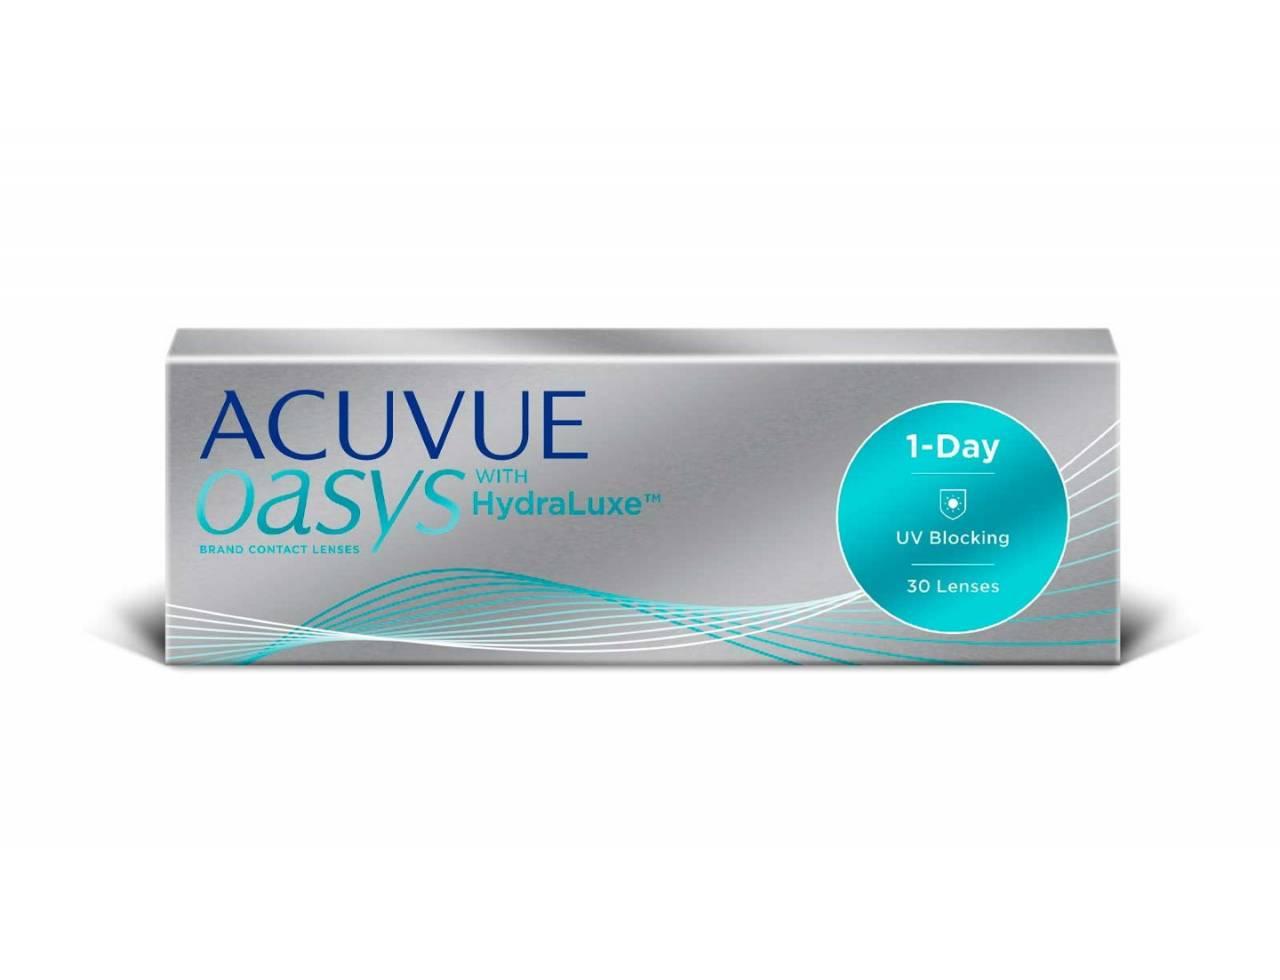 Однодневные контактные линзы Johnson & Johnson 1-Day Acuvue Oasys with HydraLuxe